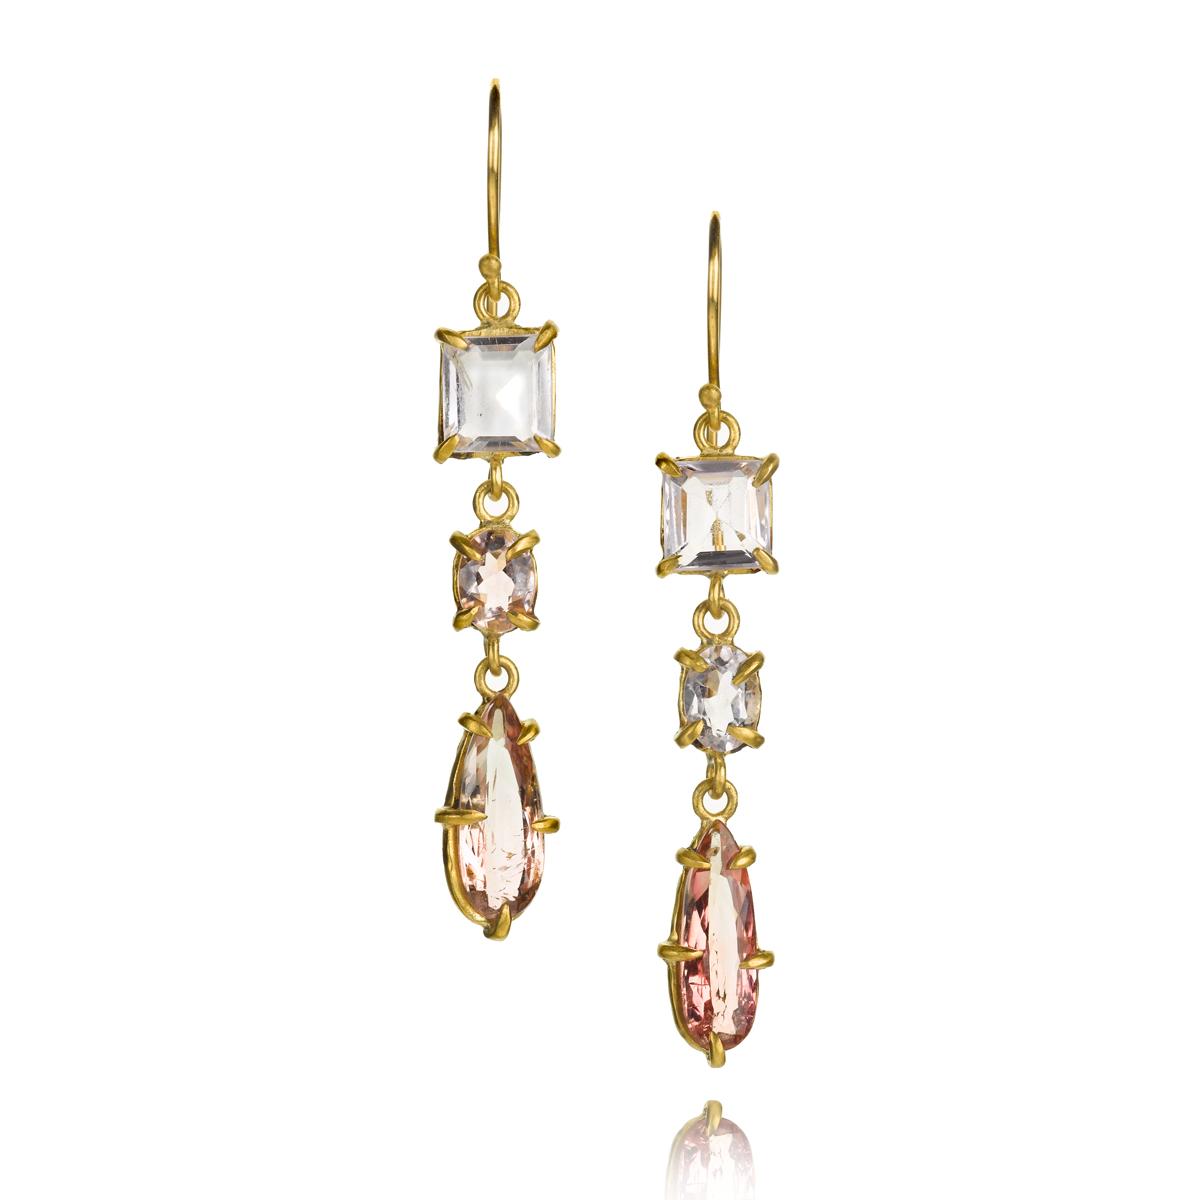 22k gold earrings with tourmaline, morganite and kunzite,$2,765.